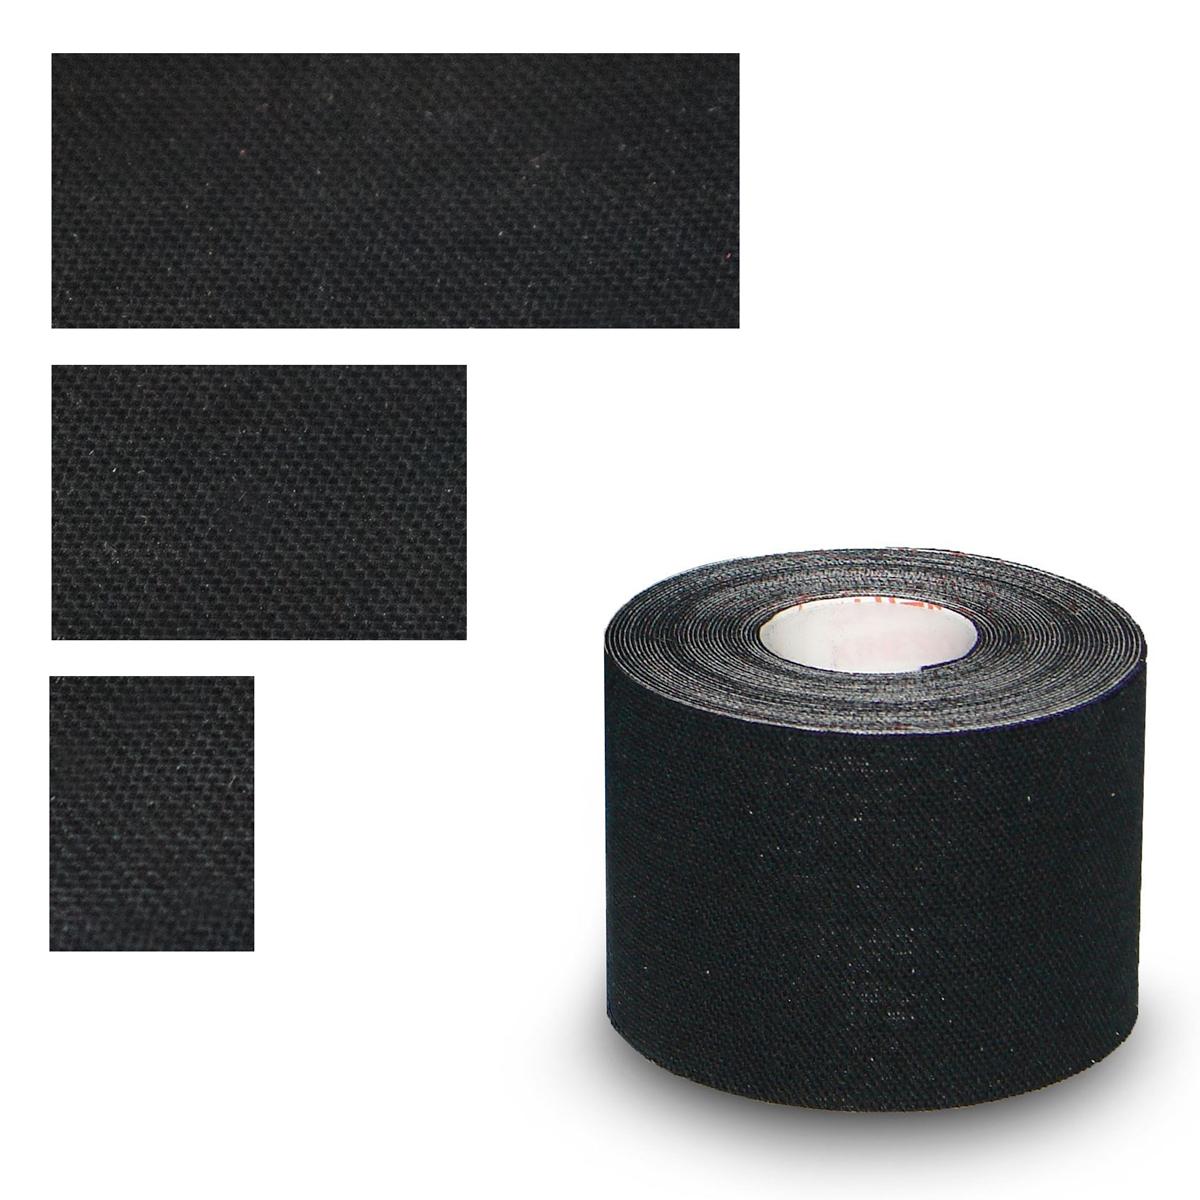 Stickseal pond liner repair strips epdm rubber butyl 150mm for Pond liner repair